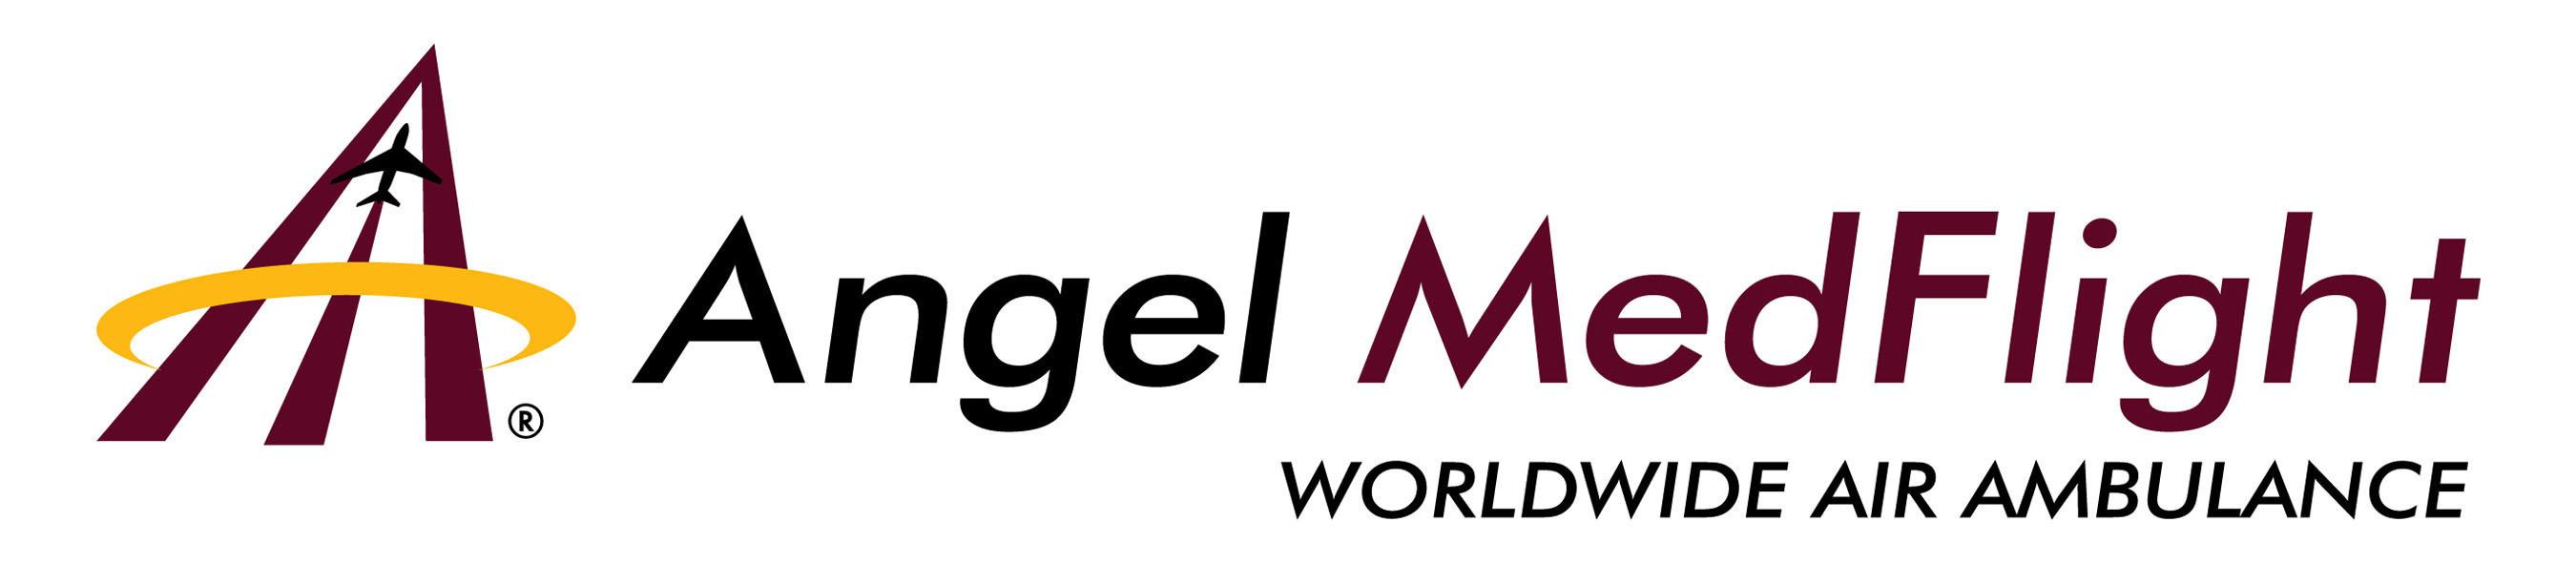 Board Of Certification For Emergency Nursing Honors Angel Medflight